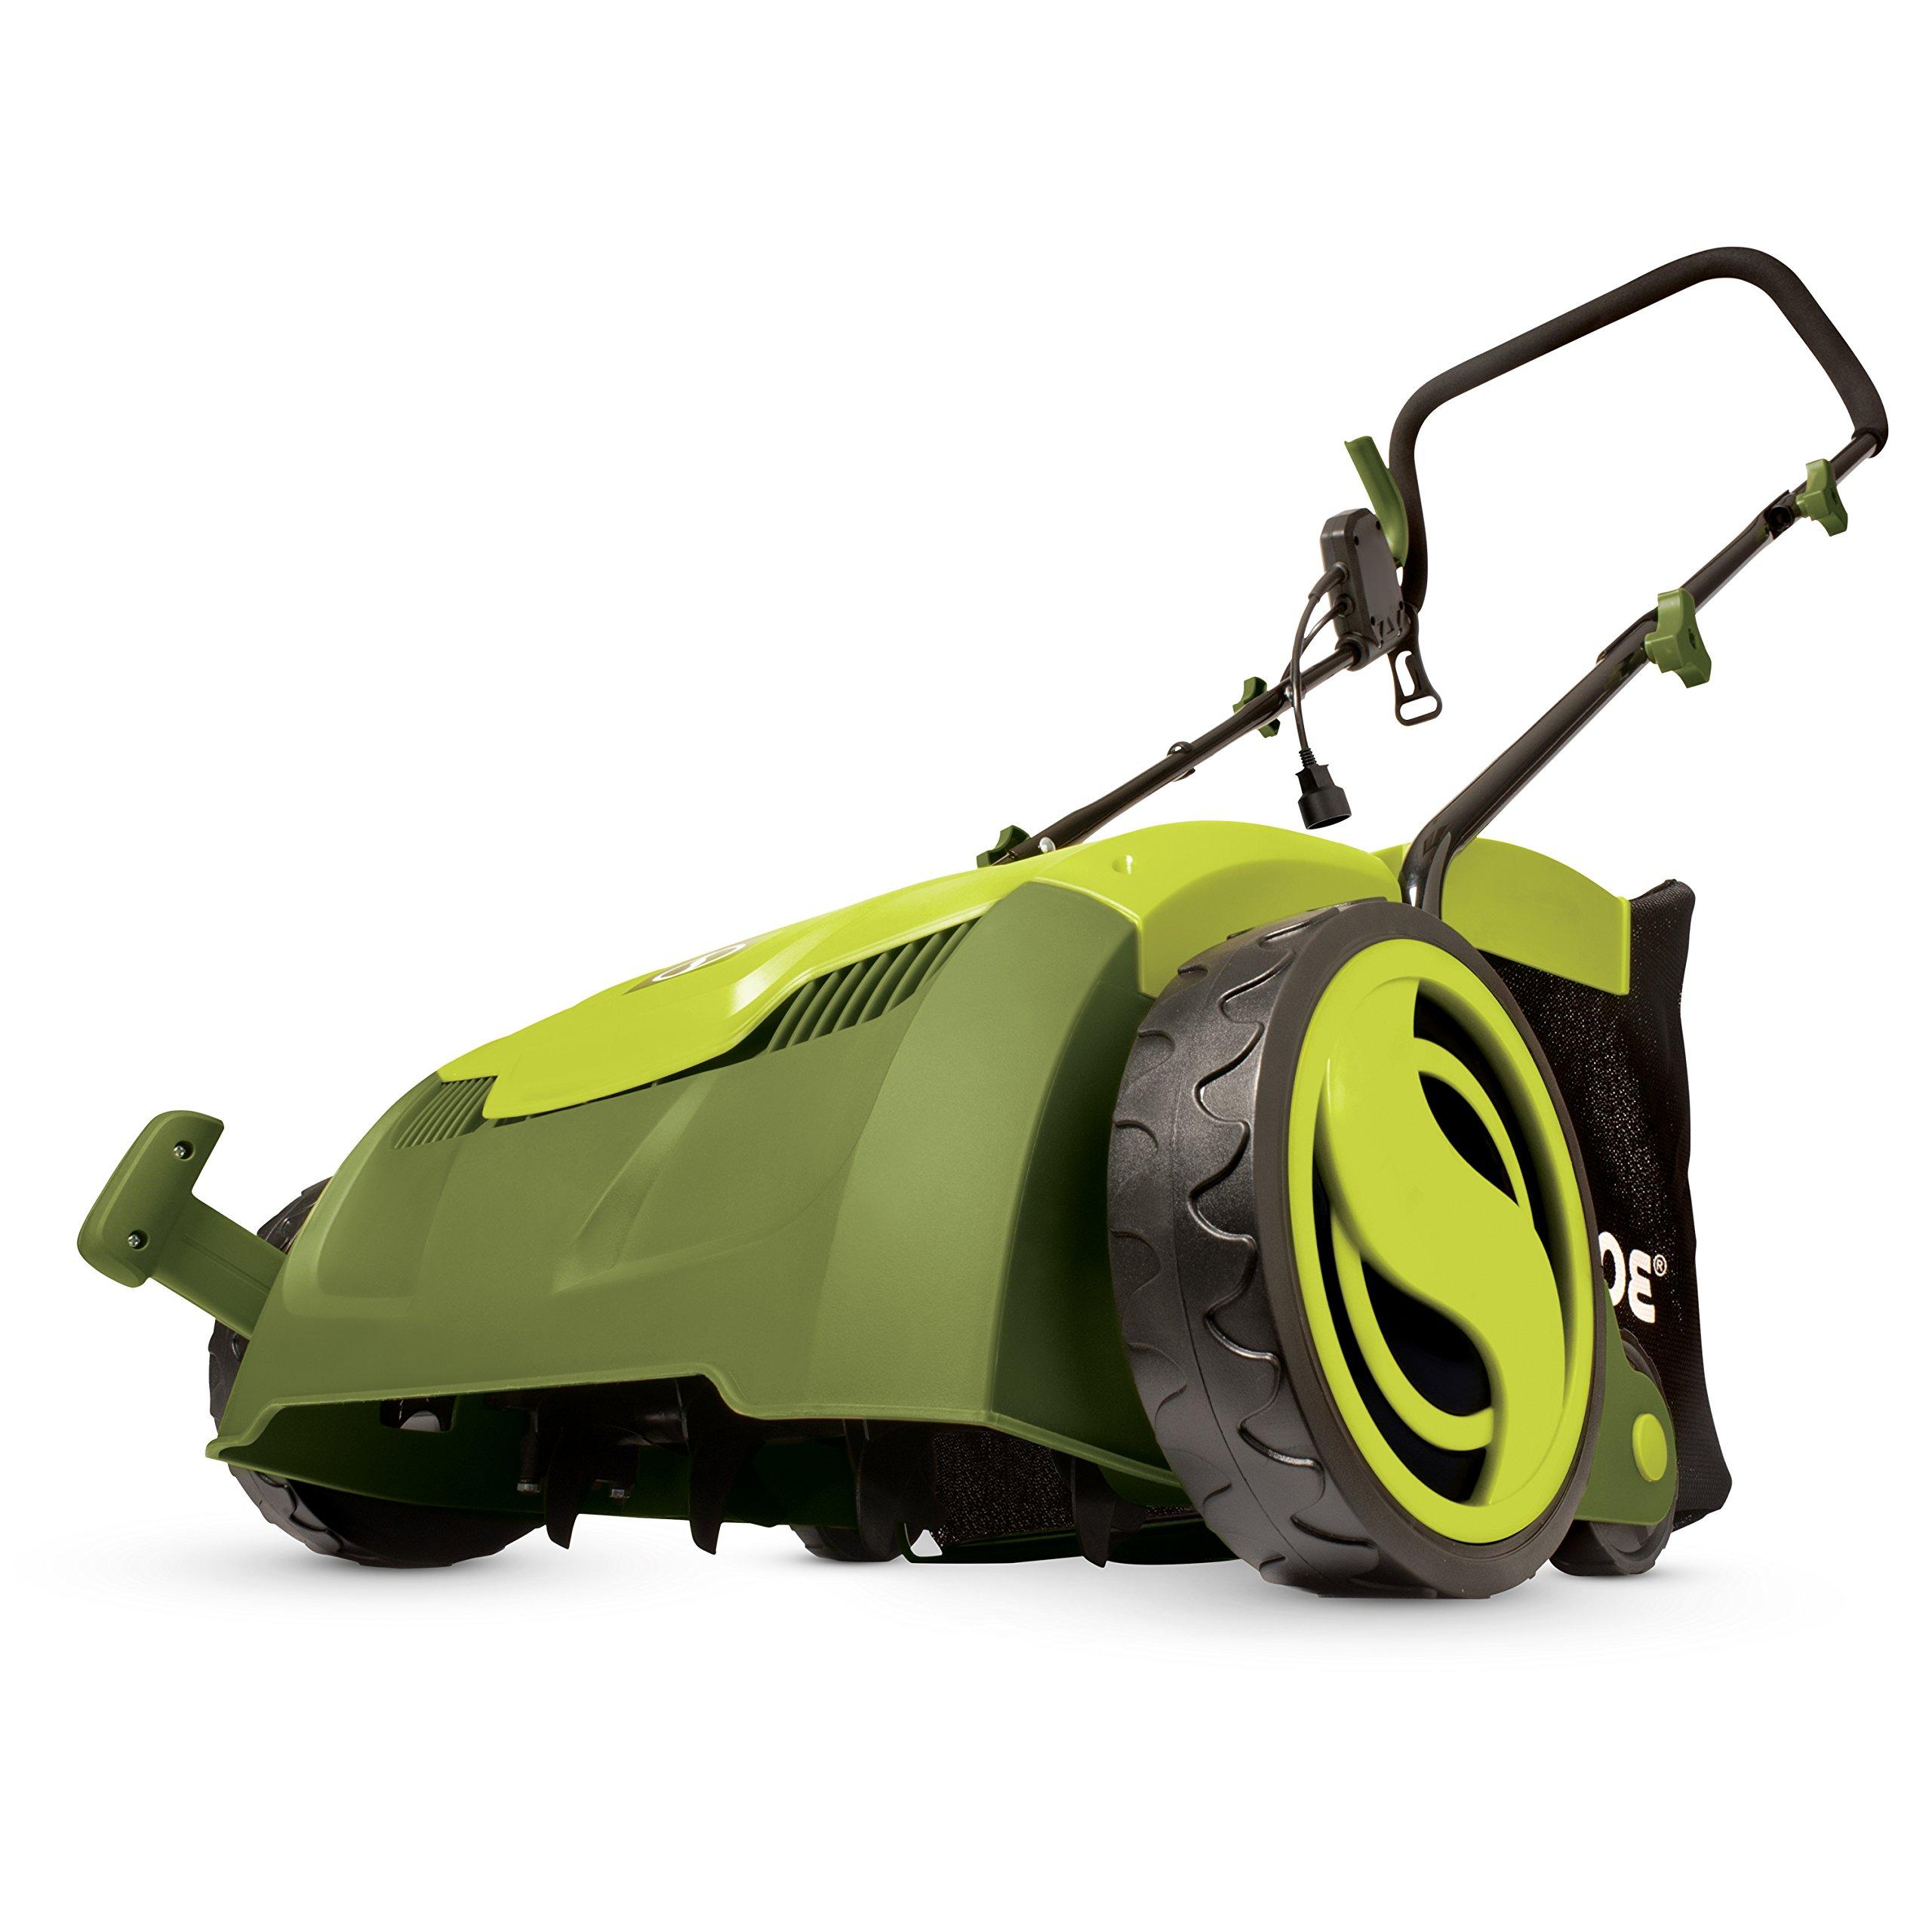 Sun Joe AJ801E 13 in. 12 Amp Electric Scarifier + Lawn Dethatcher w/Collection Bag, Green by Sun Joe